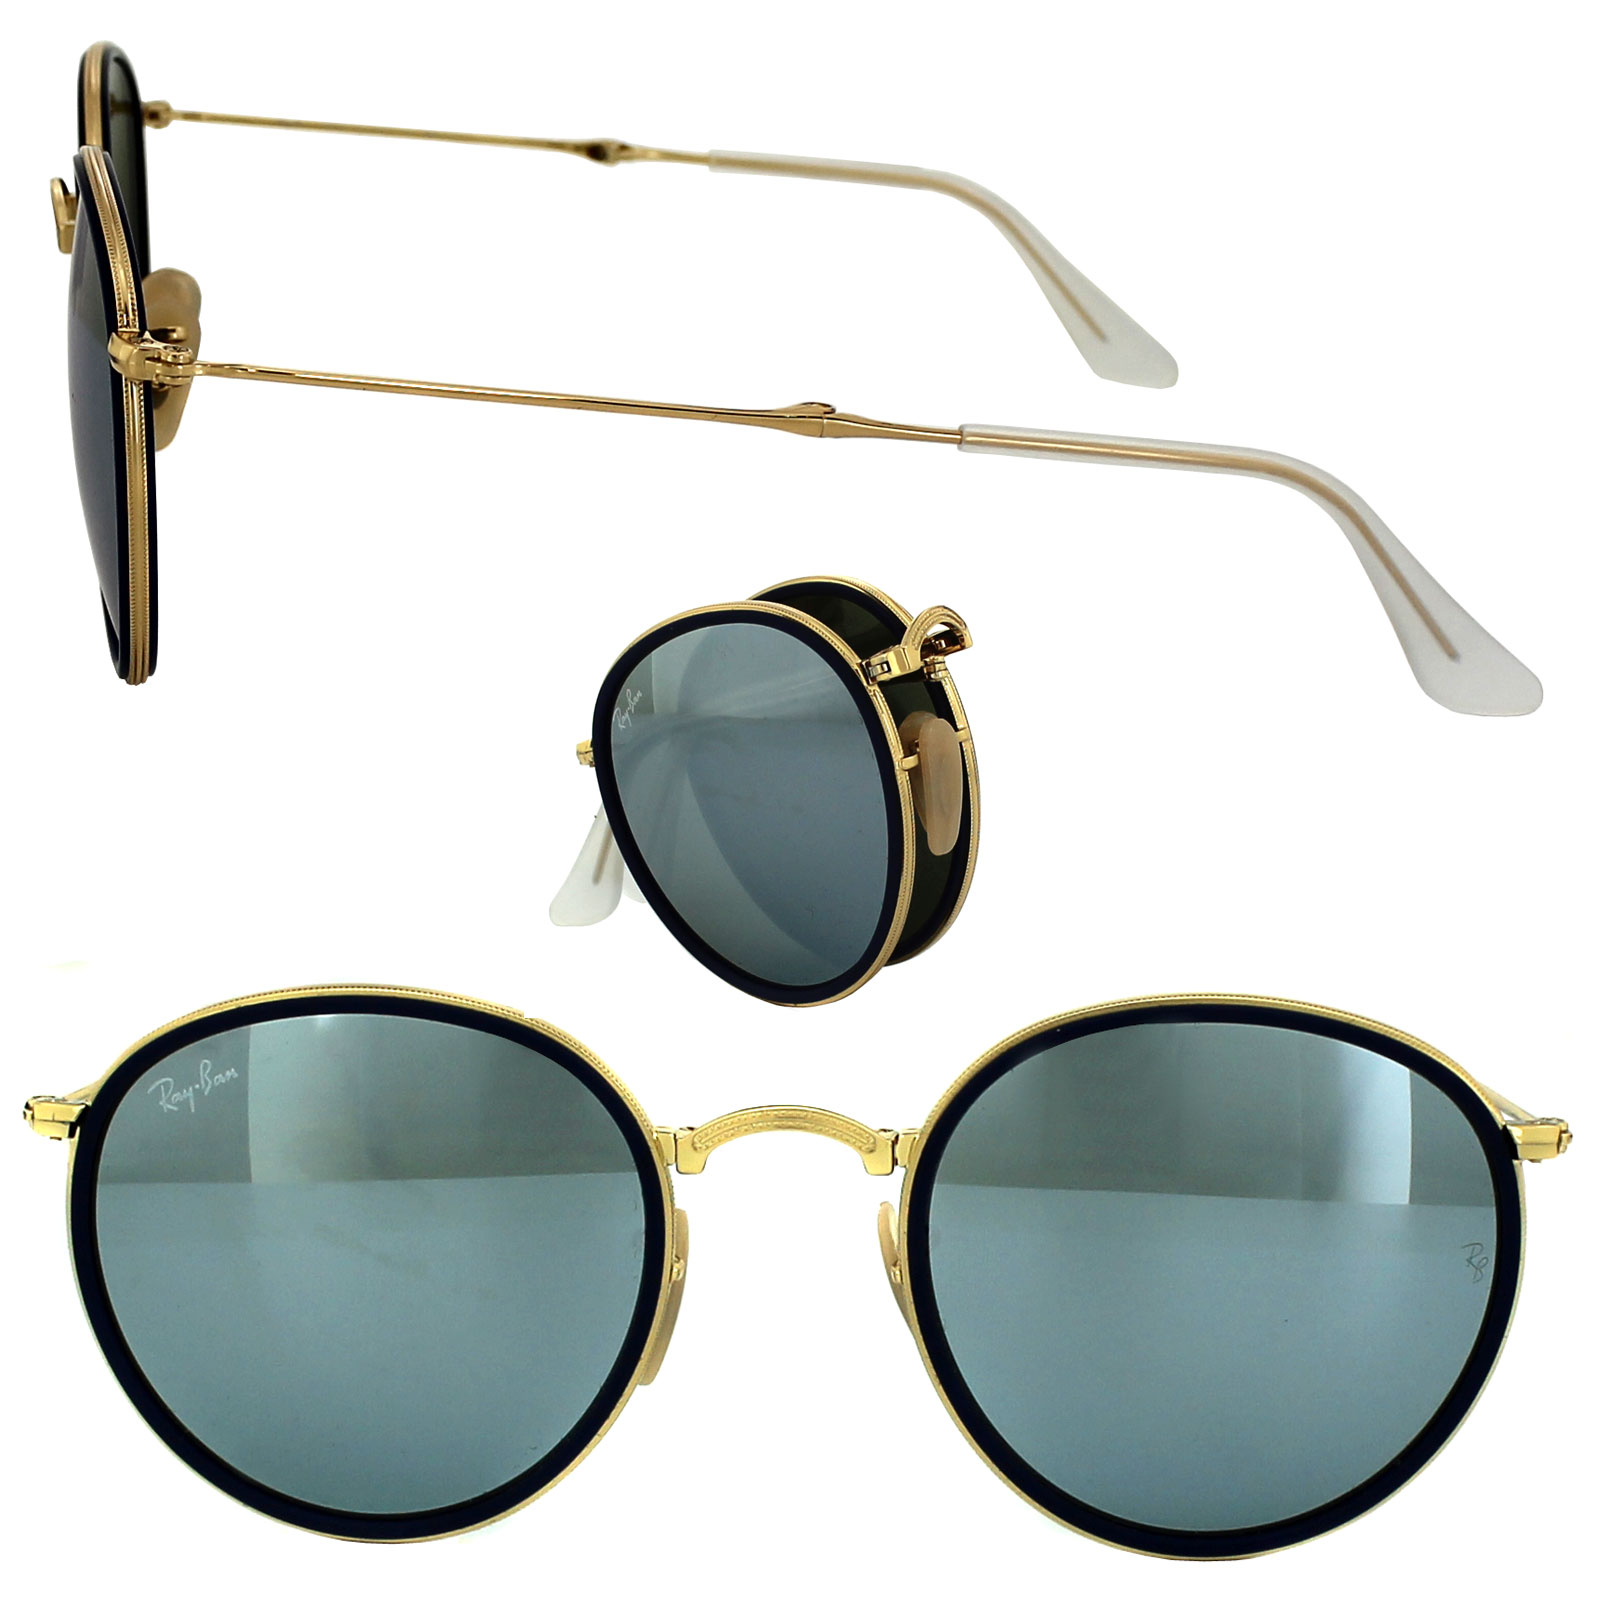 Cheap Ray Ban Round Folding 3517 Sunglasses Discounted